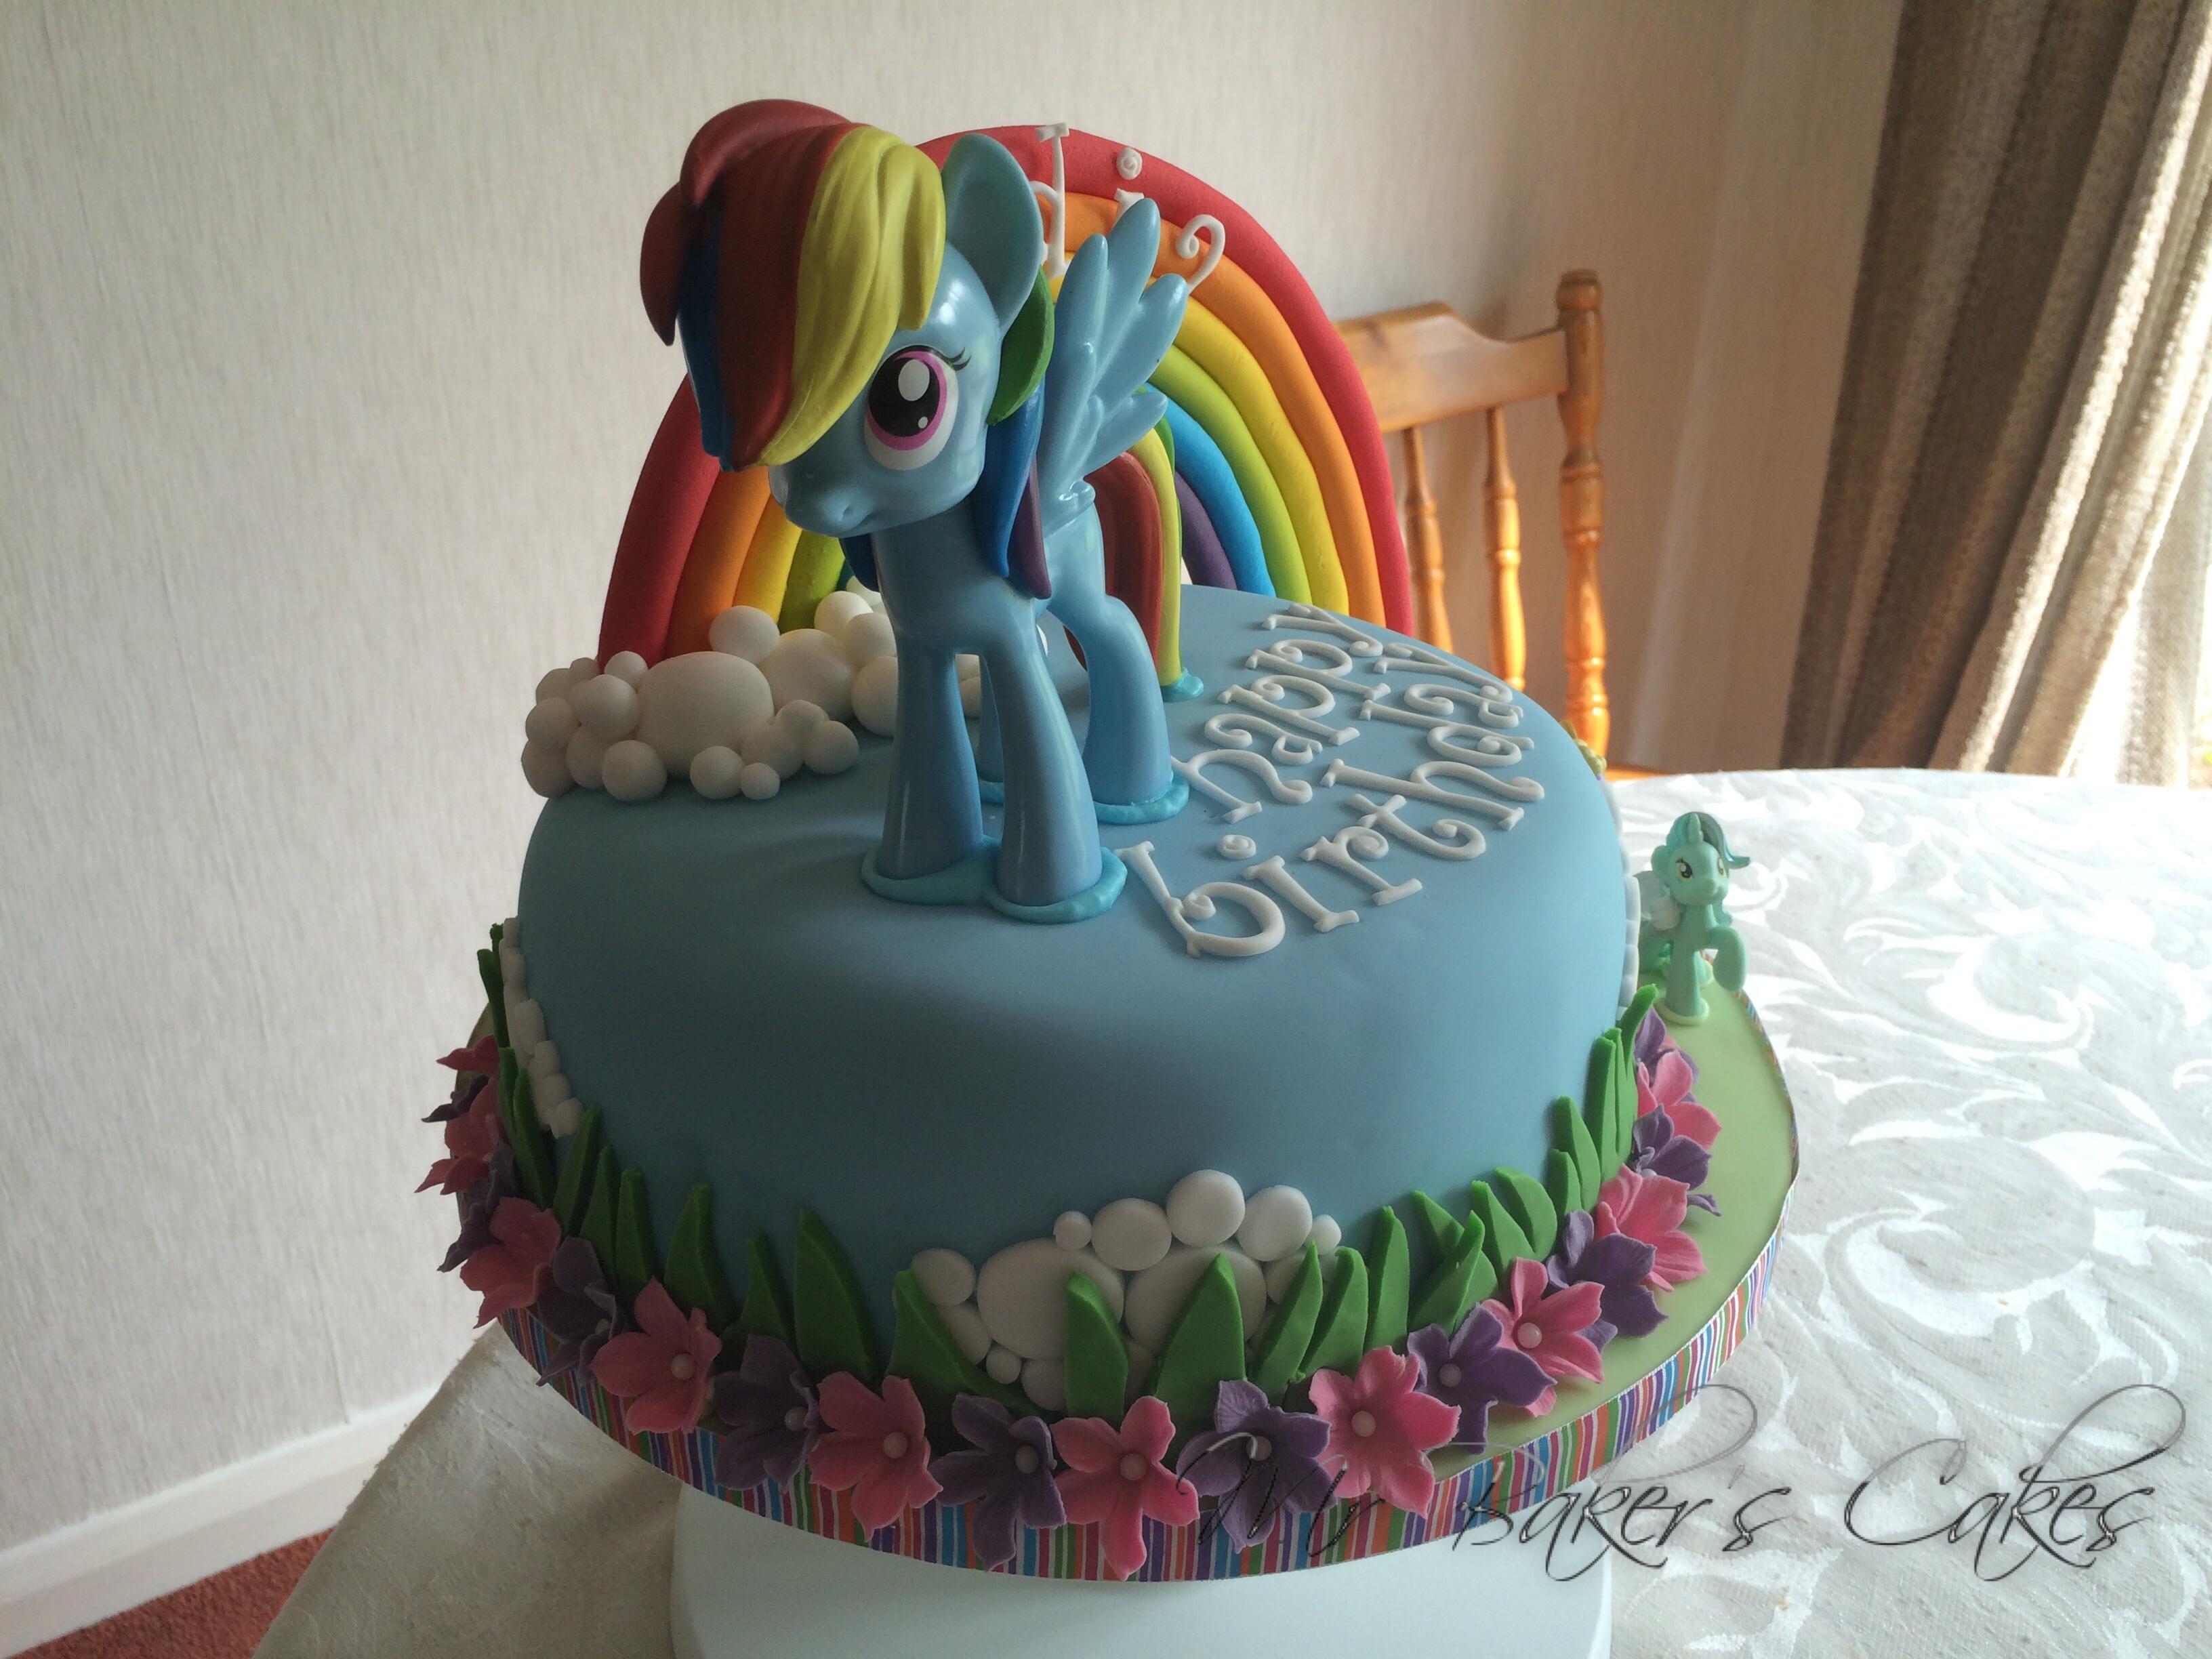 Rainbow Dash Cake Design : My Little Pony - Rainbow Dash Cake - CakeCentral.com